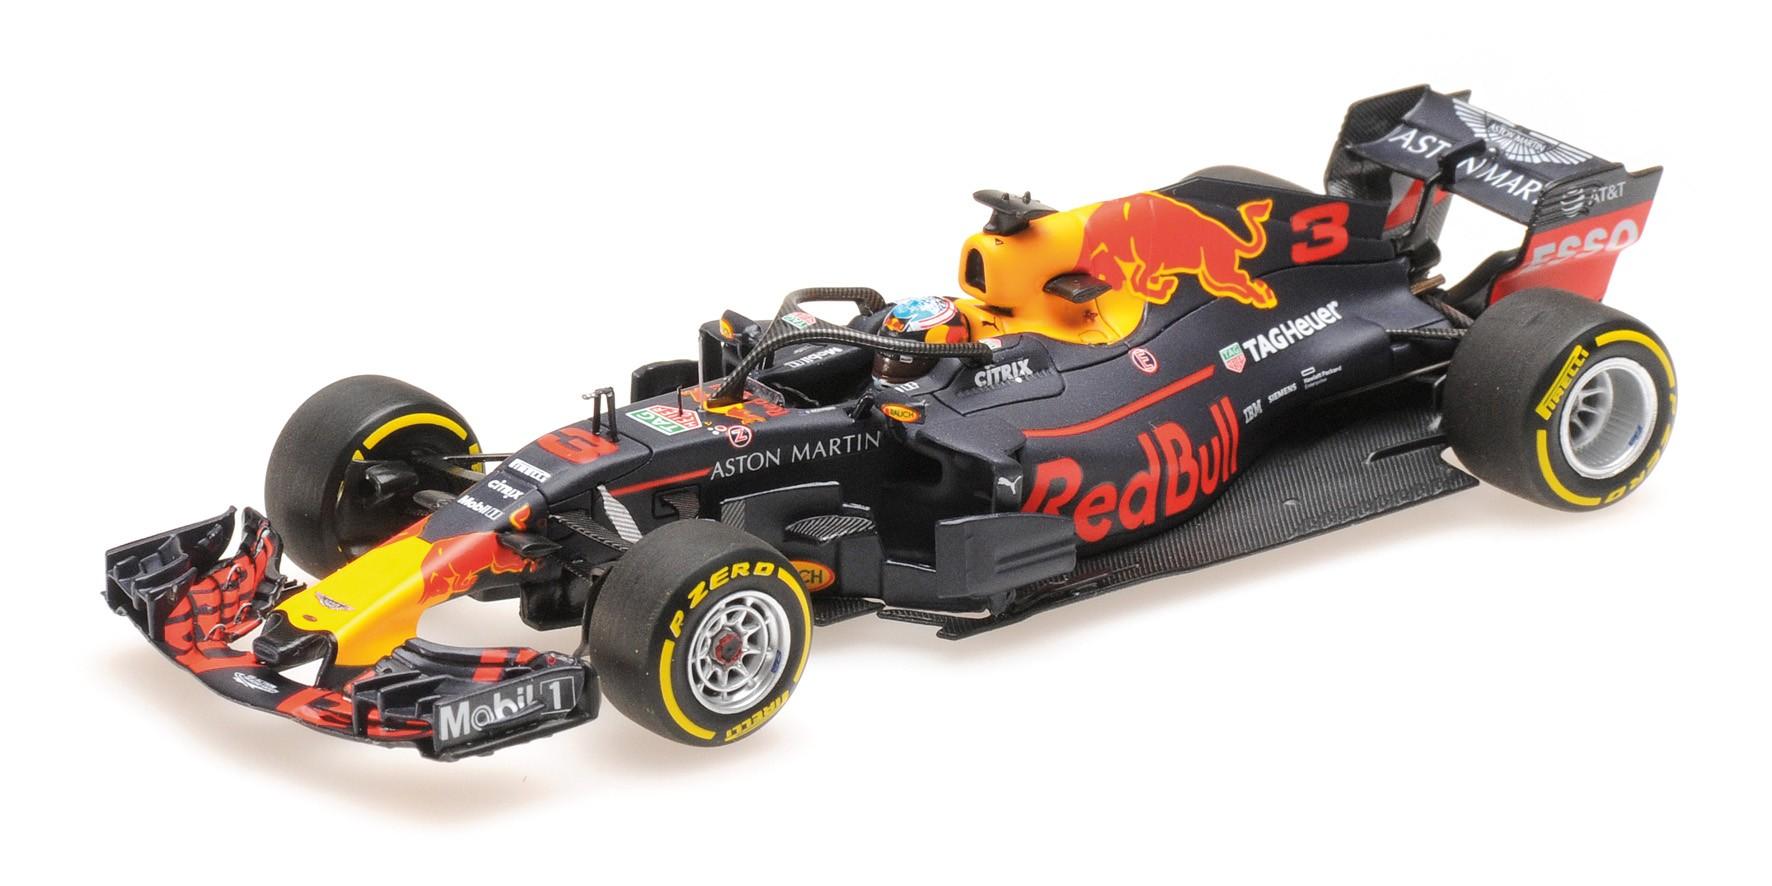 Aston Martin Red Bull Racing F Showcar Daniel Ricciardo - F1 show car